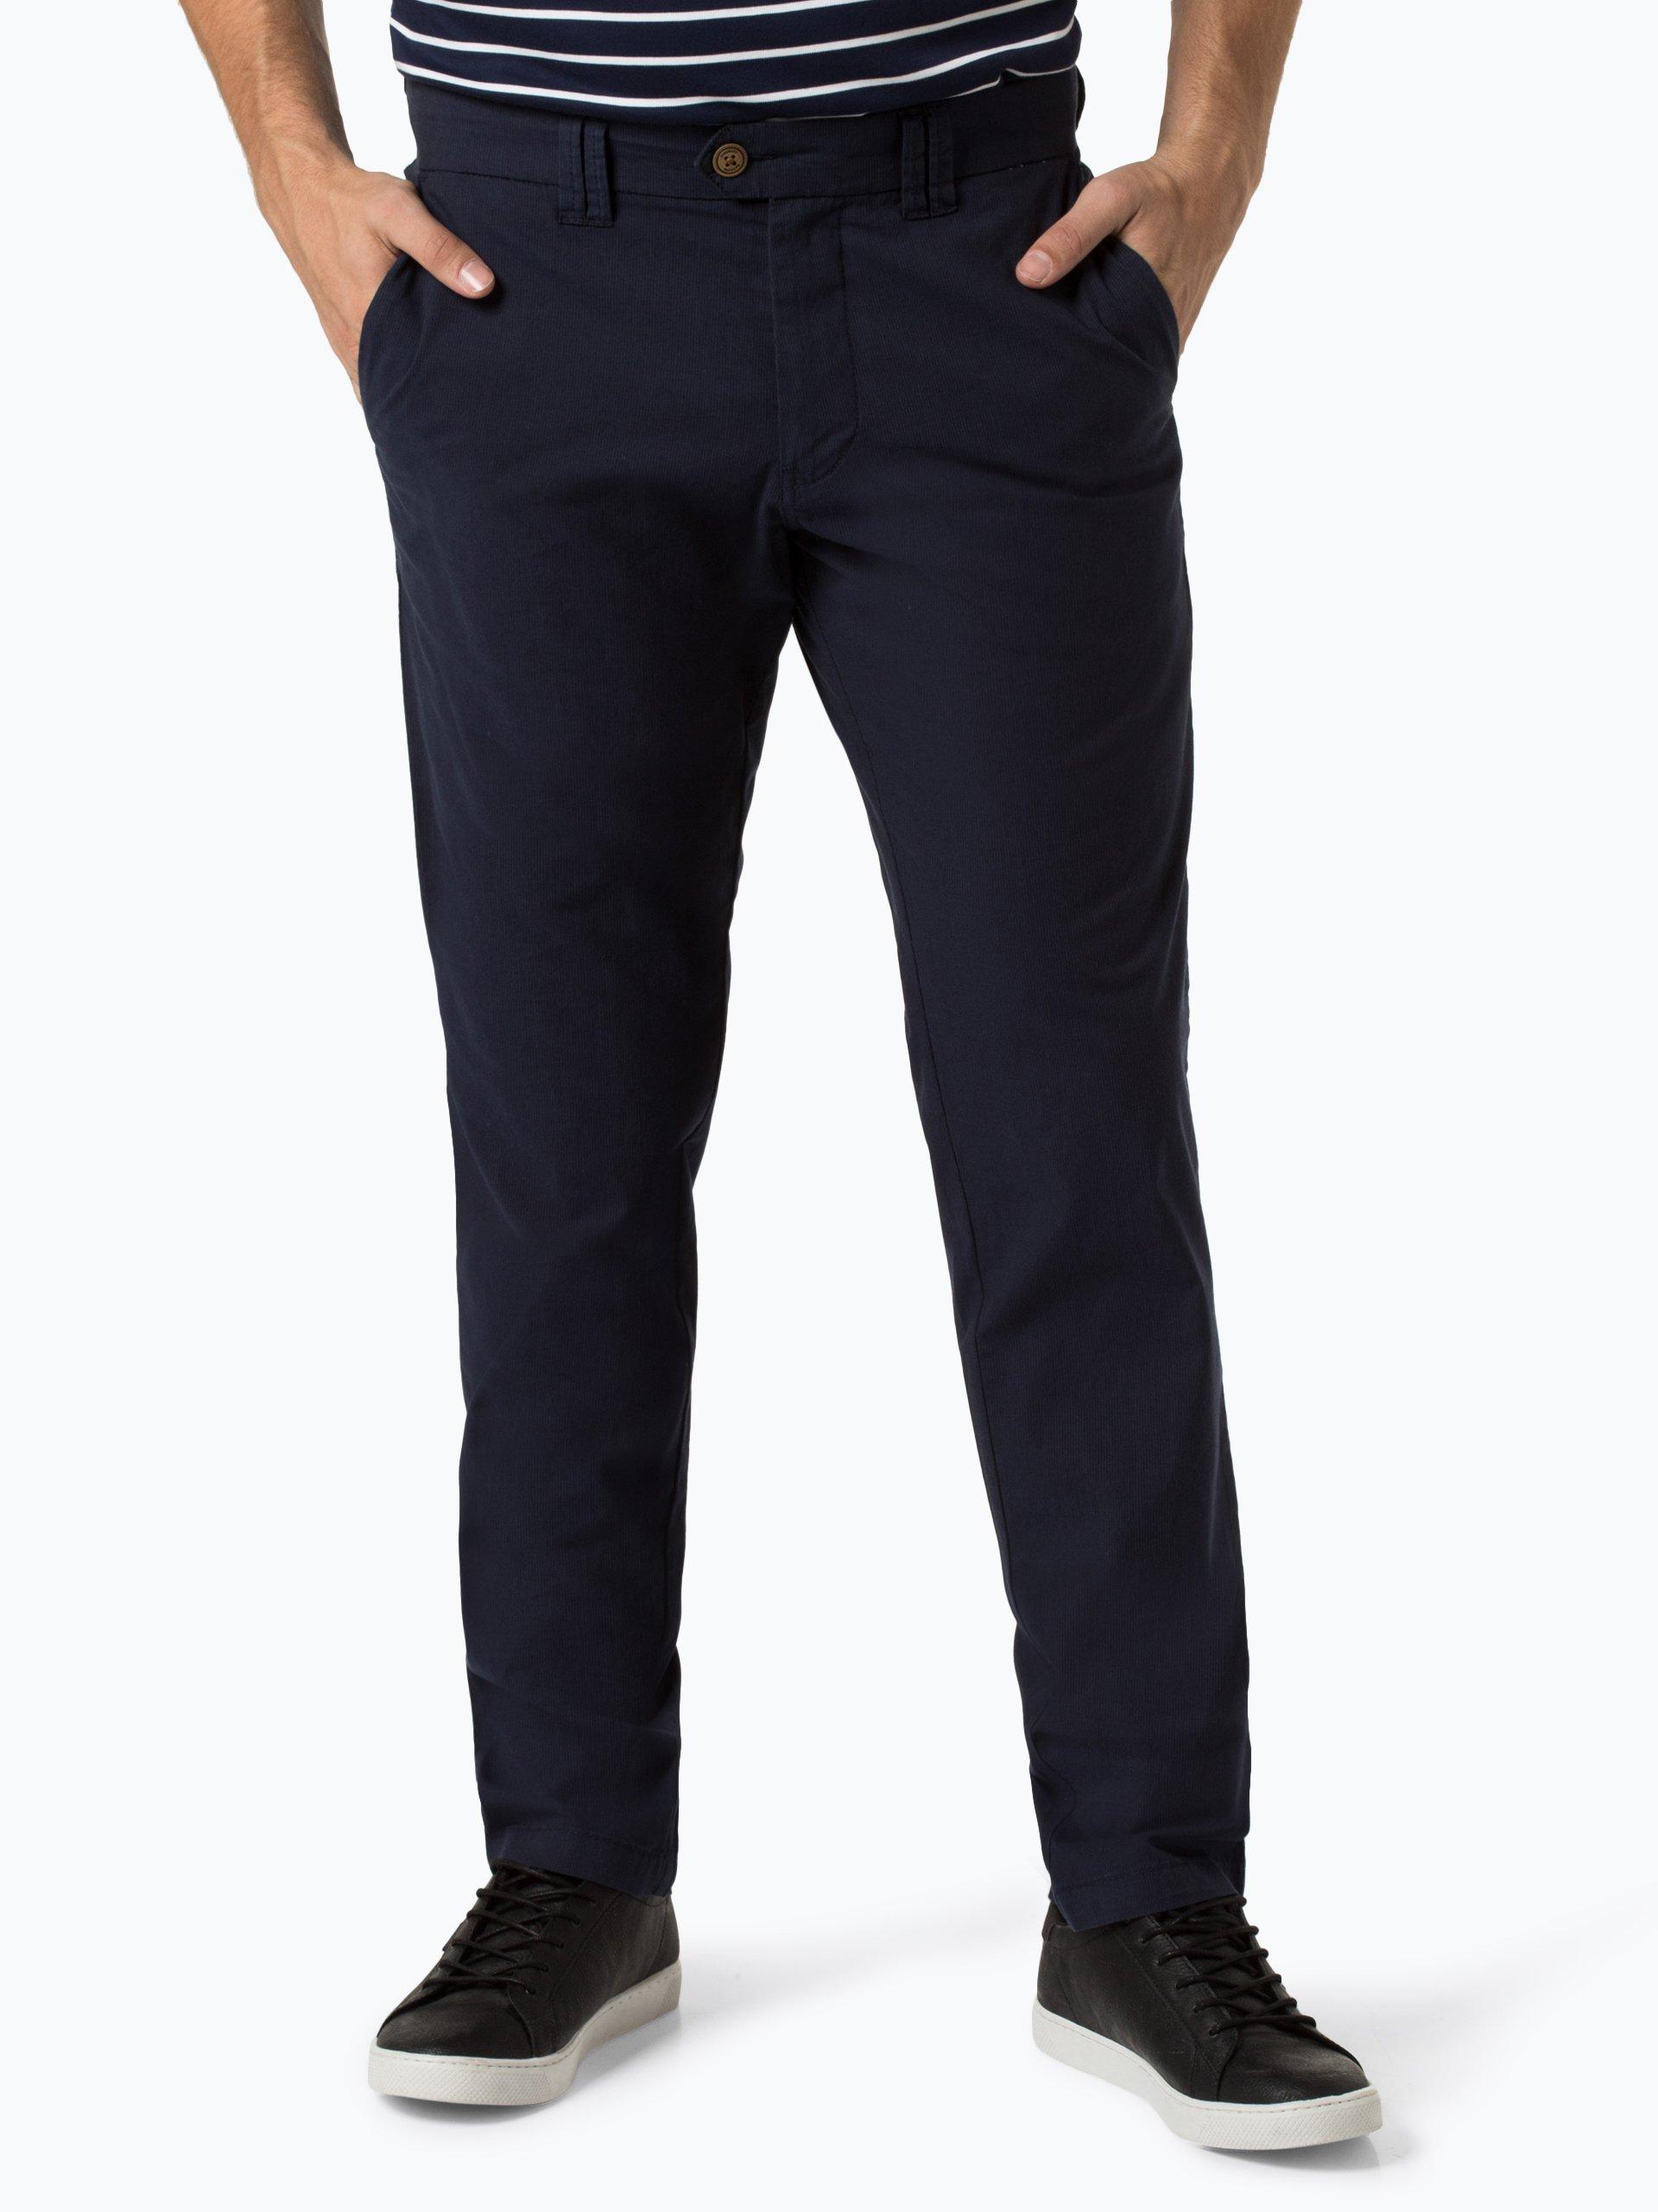 Finshley & Harding Spodnie męskie